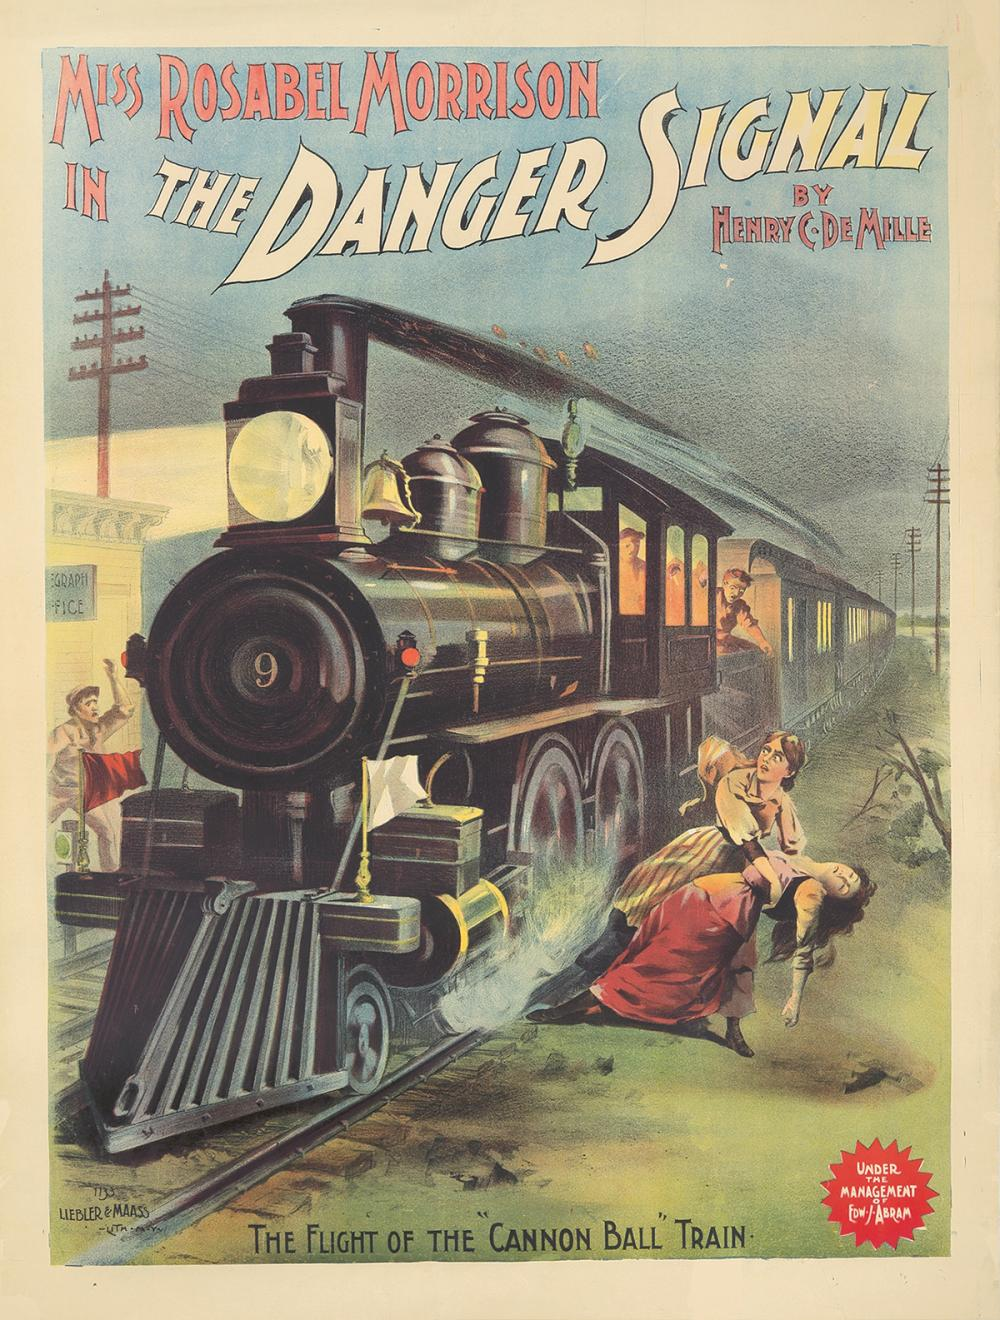 The Danger Signal. ca. 1891.